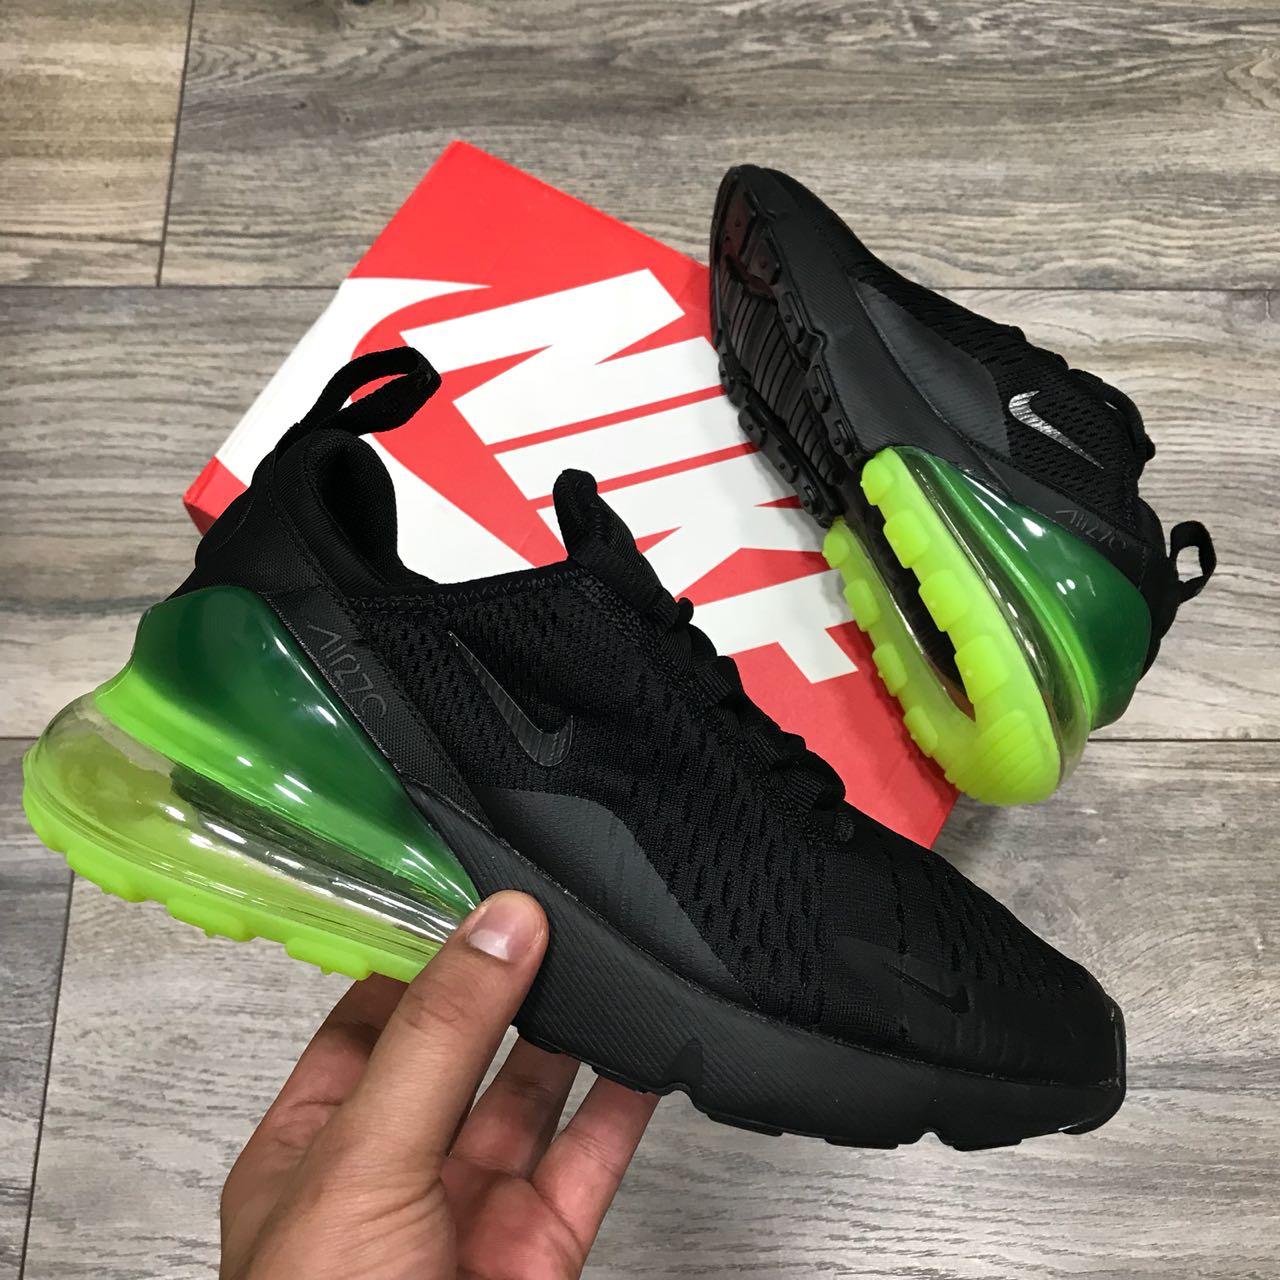 Max Air Caballero Y Importadas Zapatillas 270 Dama Nike ZWwqnwOxE